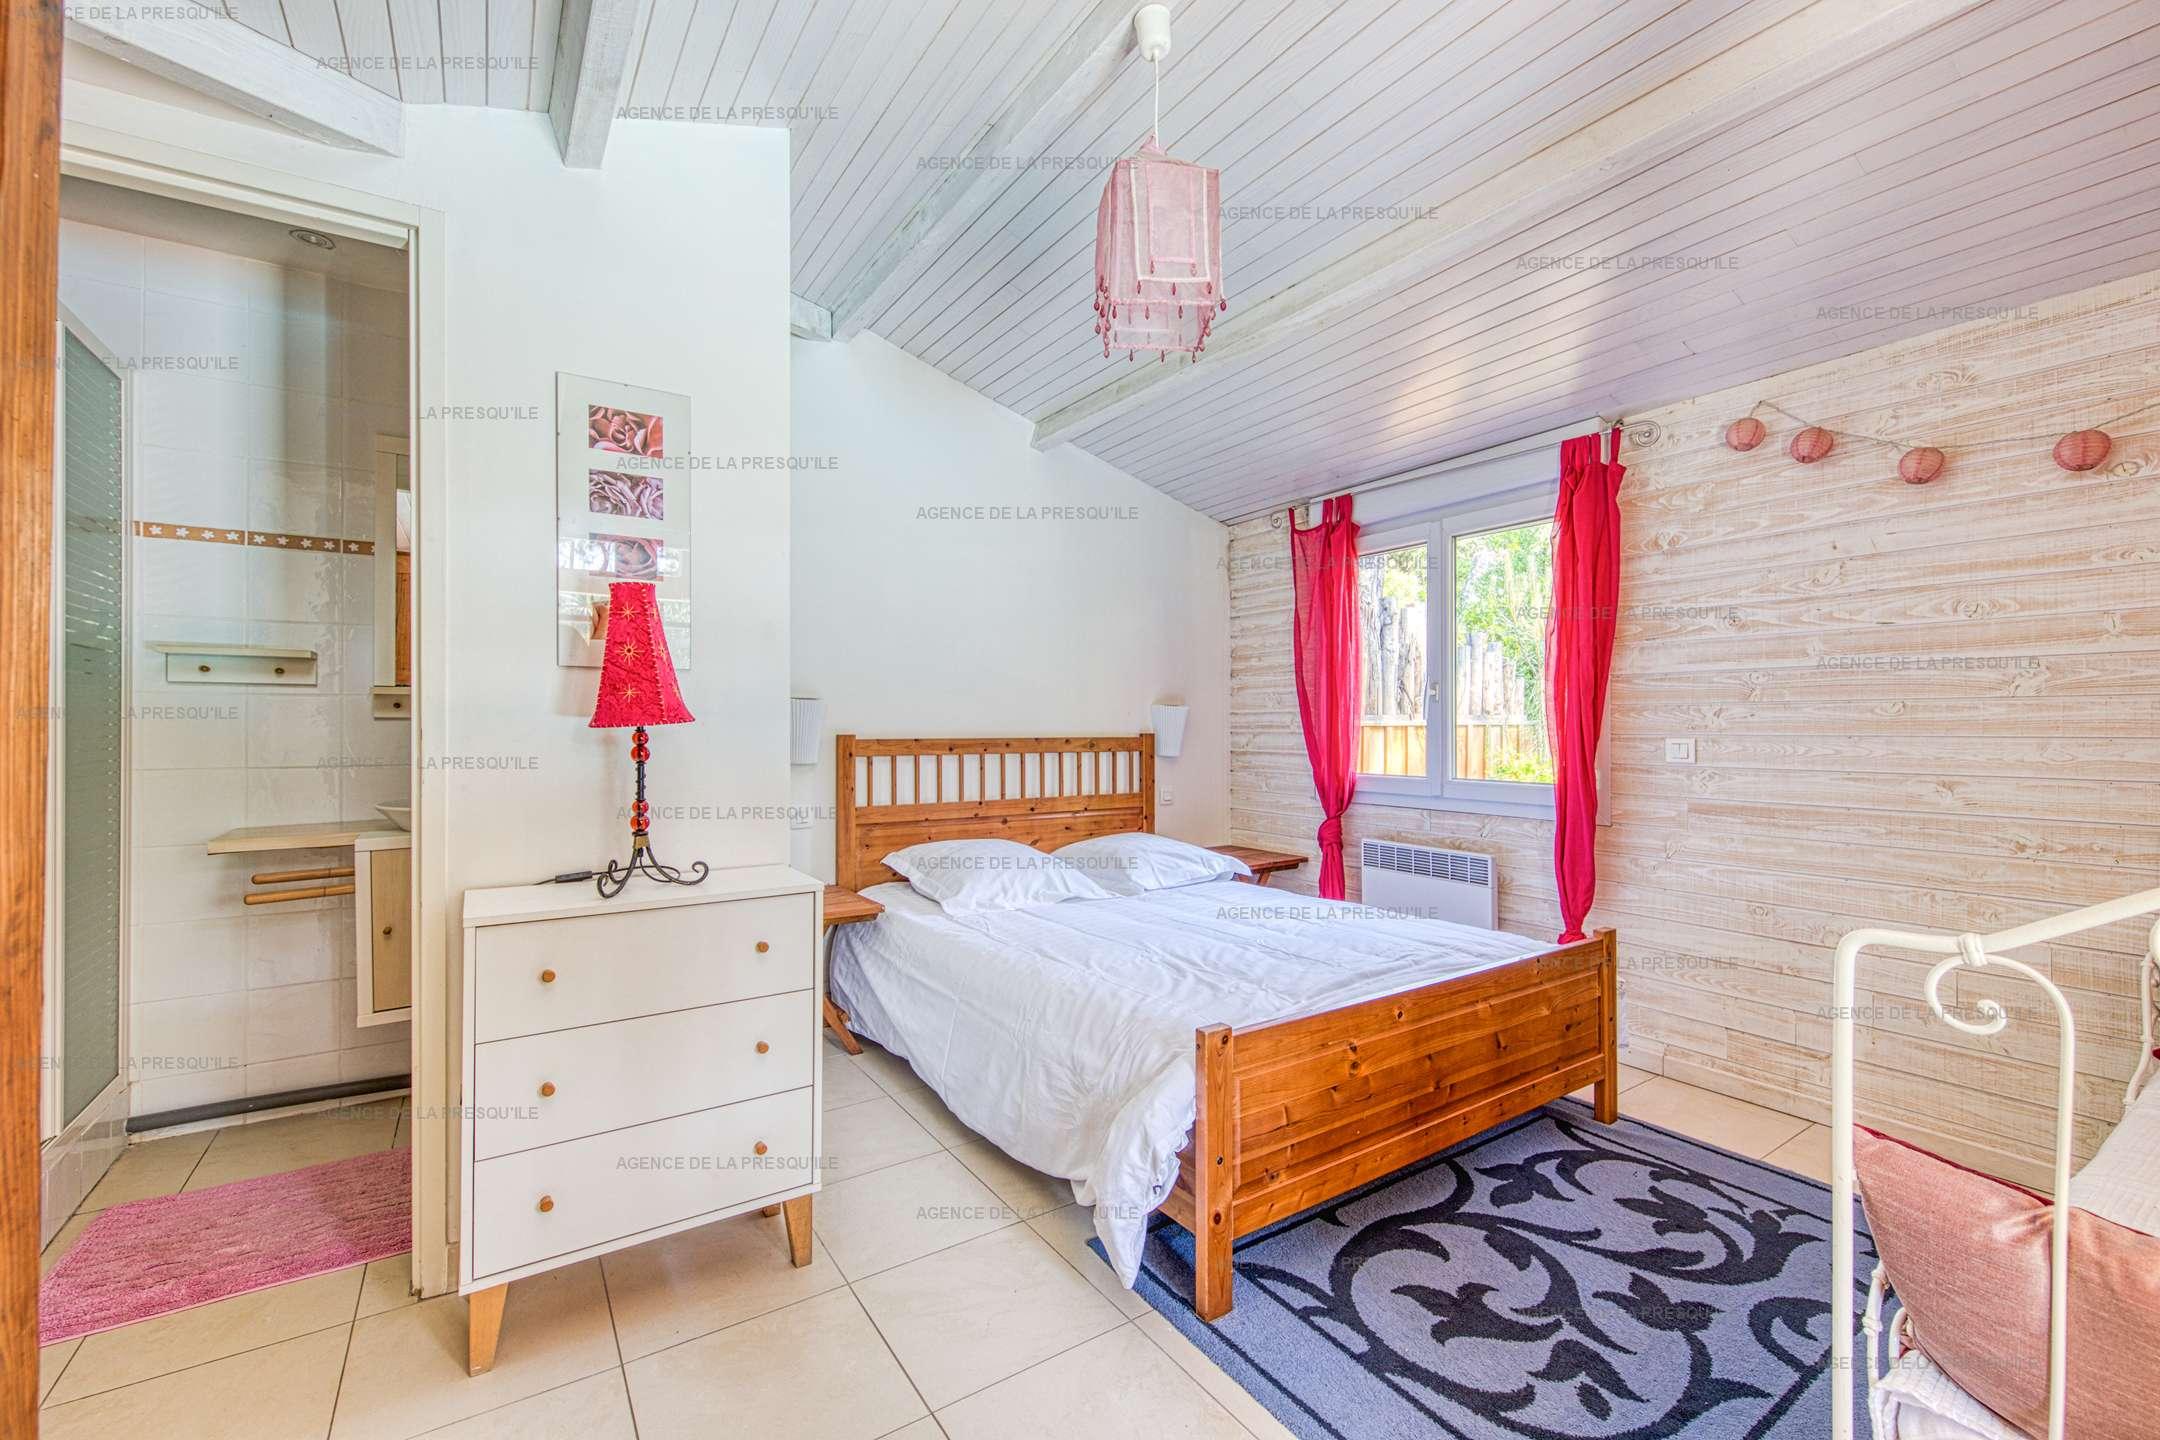 Location: Charmante villa avec piscine entre bassin et océan 13